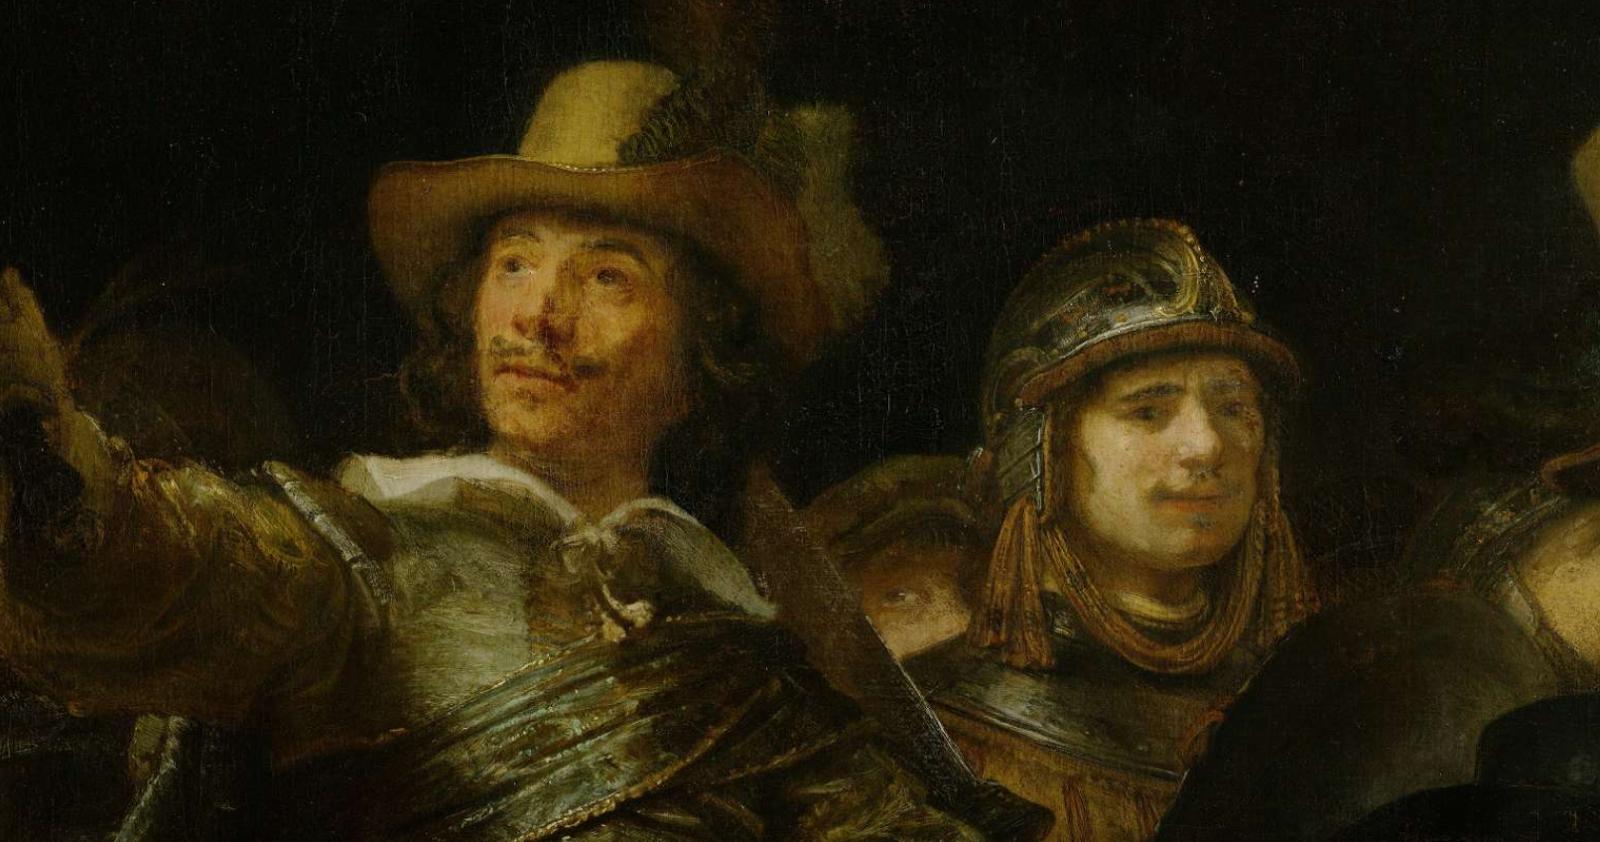 La Ronda Nocturna Rembrandt Detalles Búsqueda De Google Rembrandt Barroco Nocturno